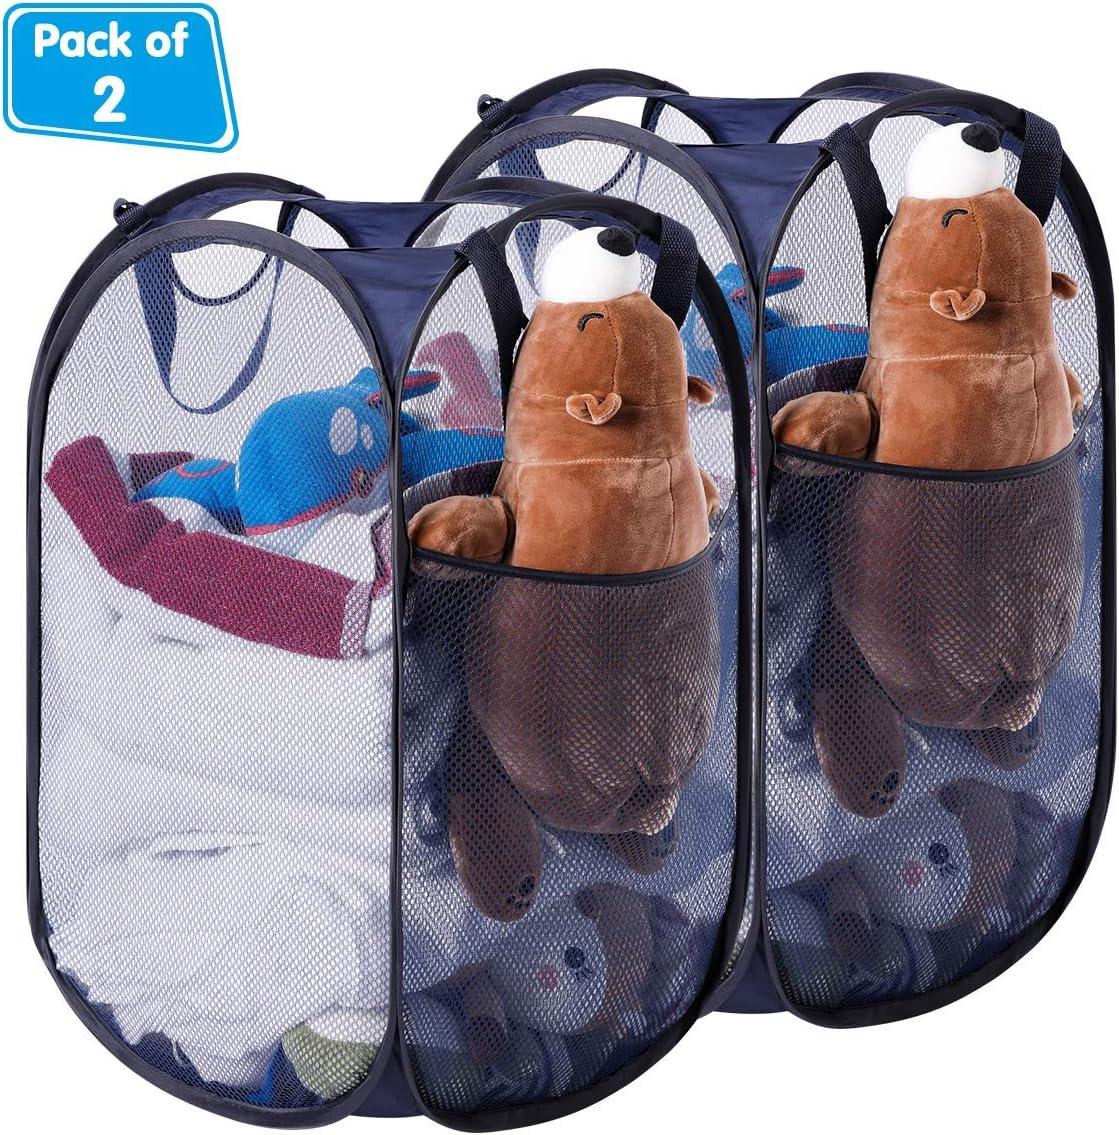 HOMEIDEAS Pack of 2 Foldable Pop-Up Mesh Laundry Hamper Basket for Dorm, Kids Room or Travel, Navy Blue